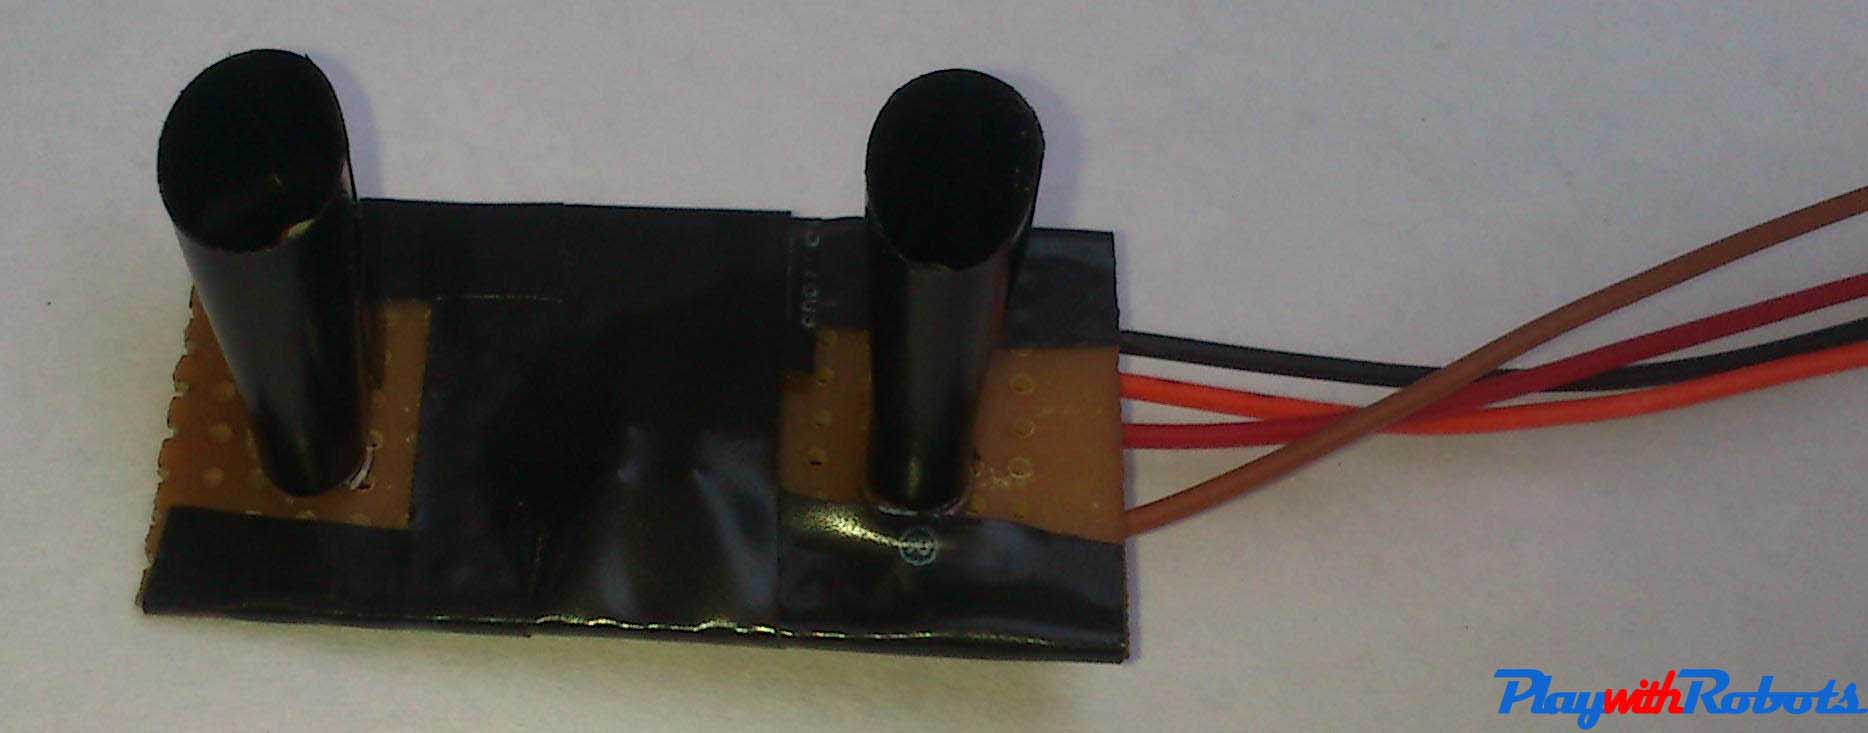 sensor covering